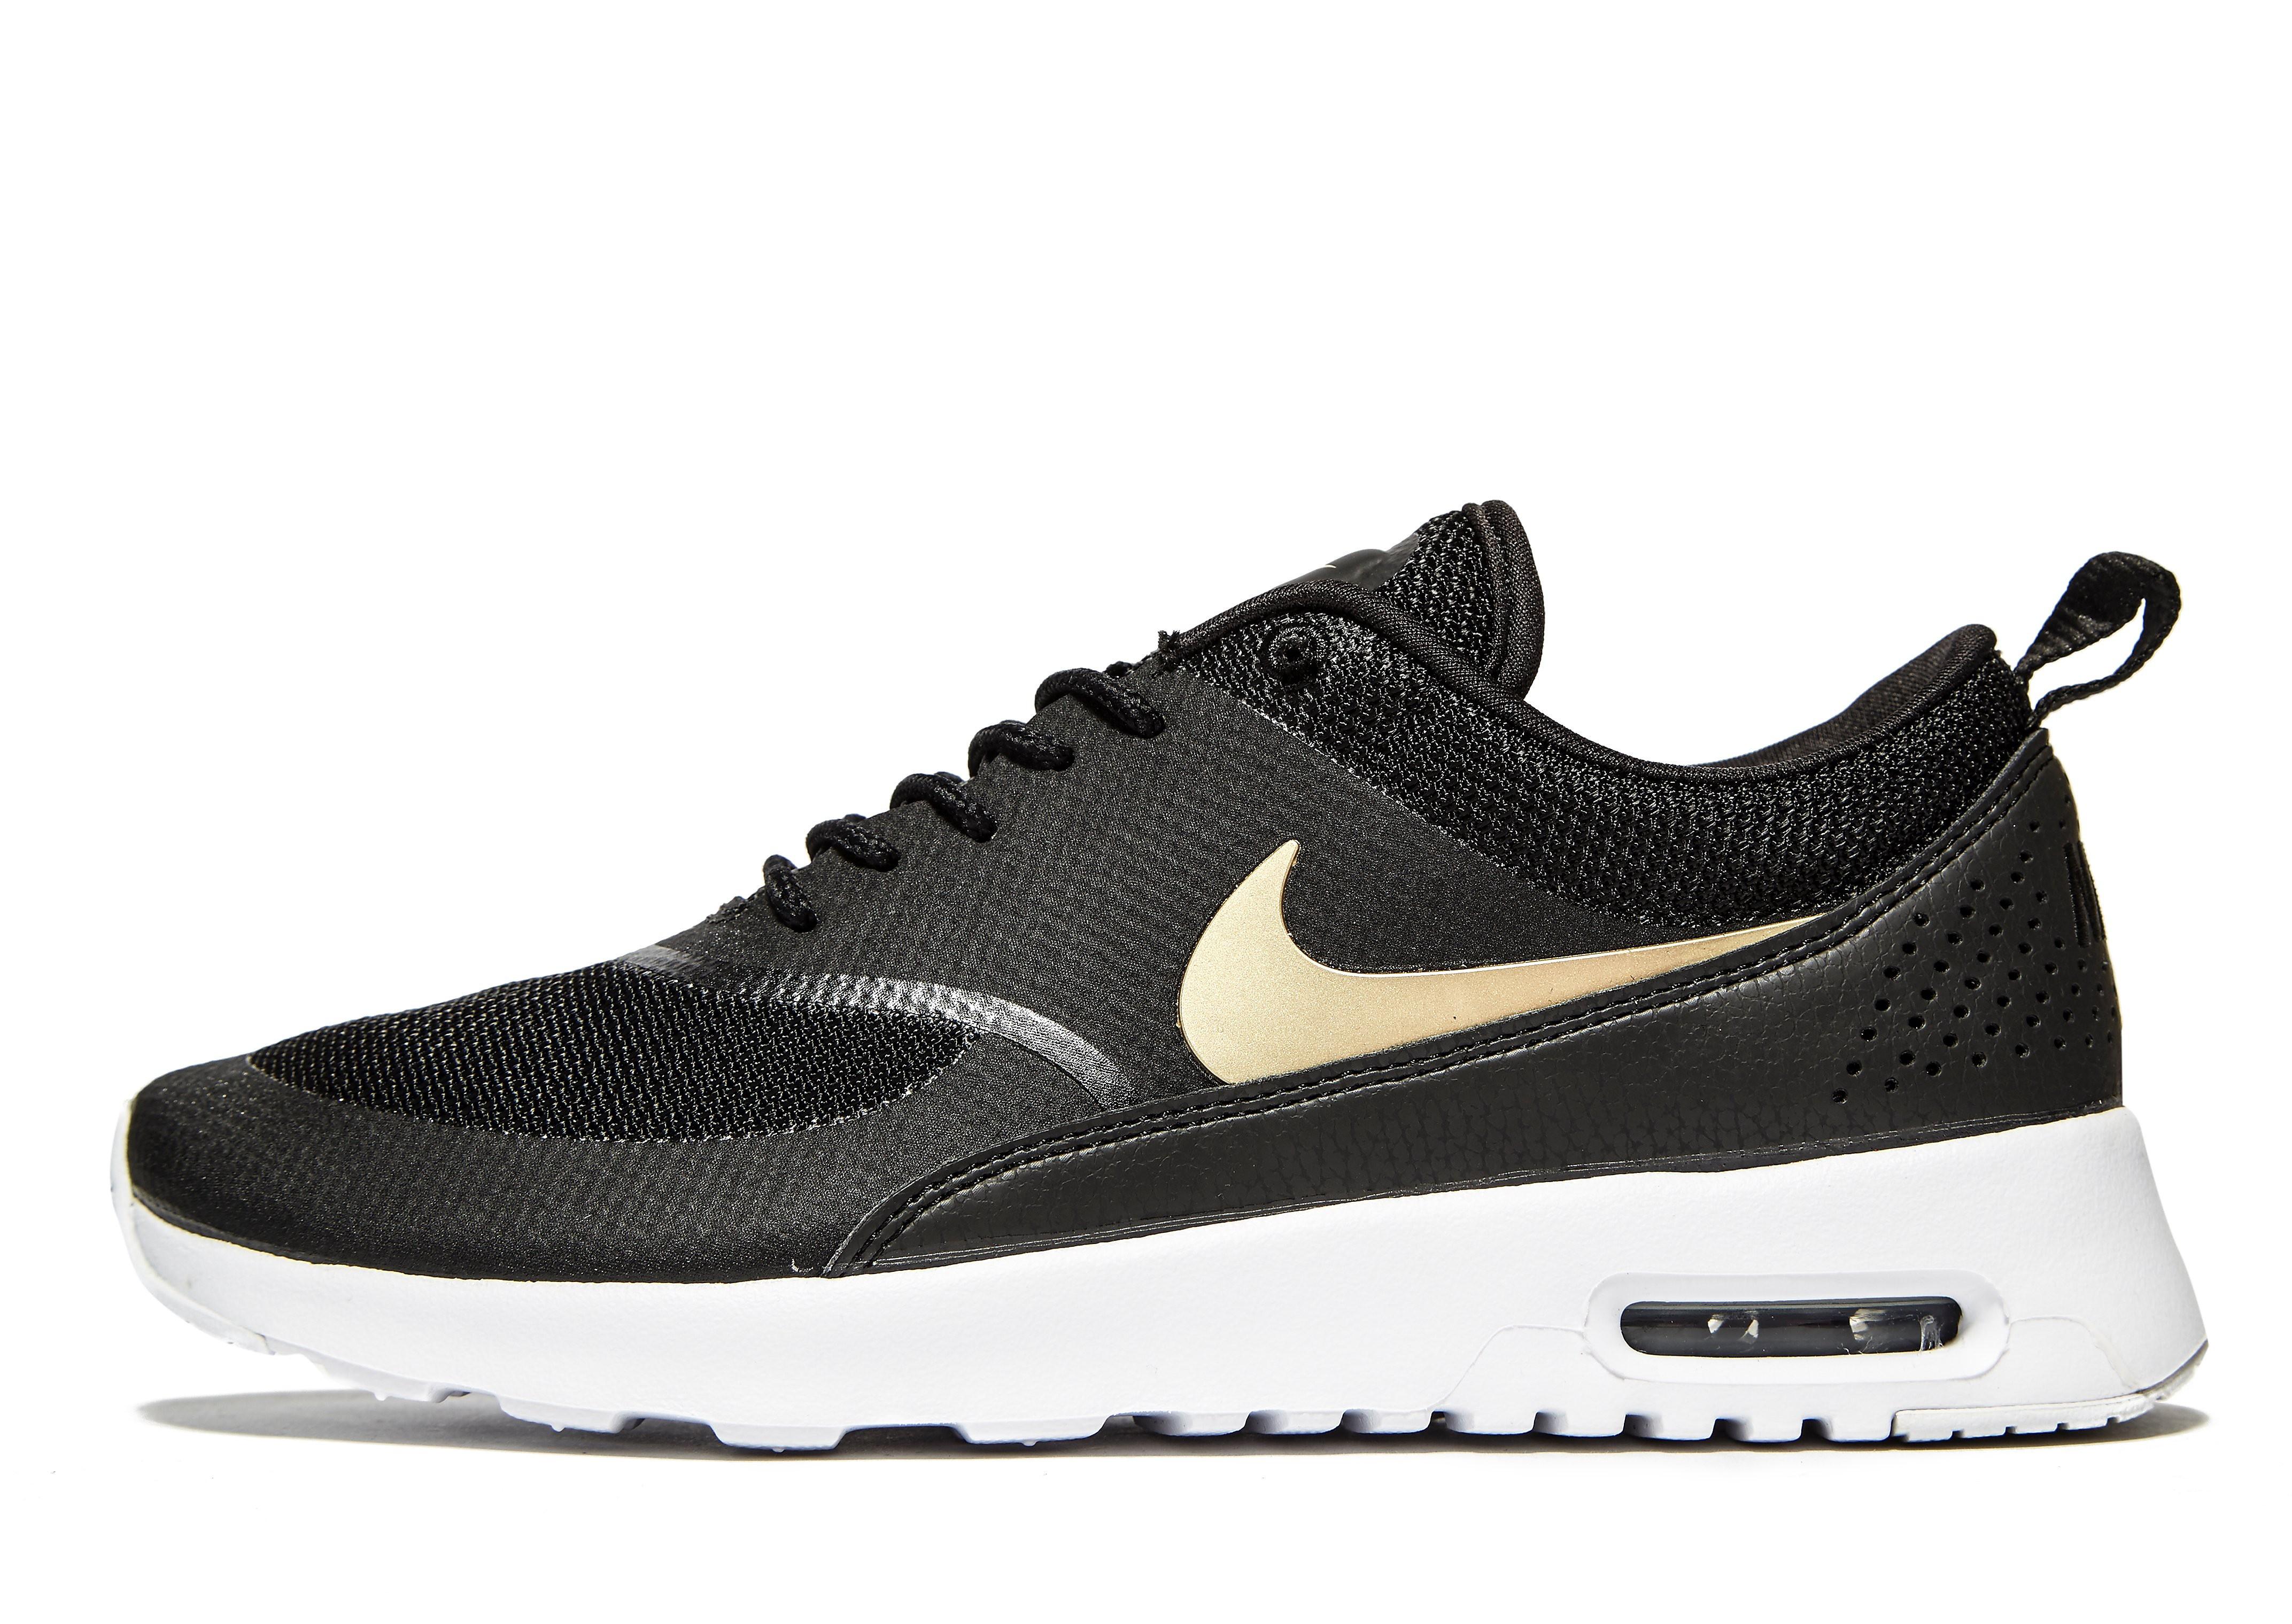 Nike Air Max Thea damessneaker zwart